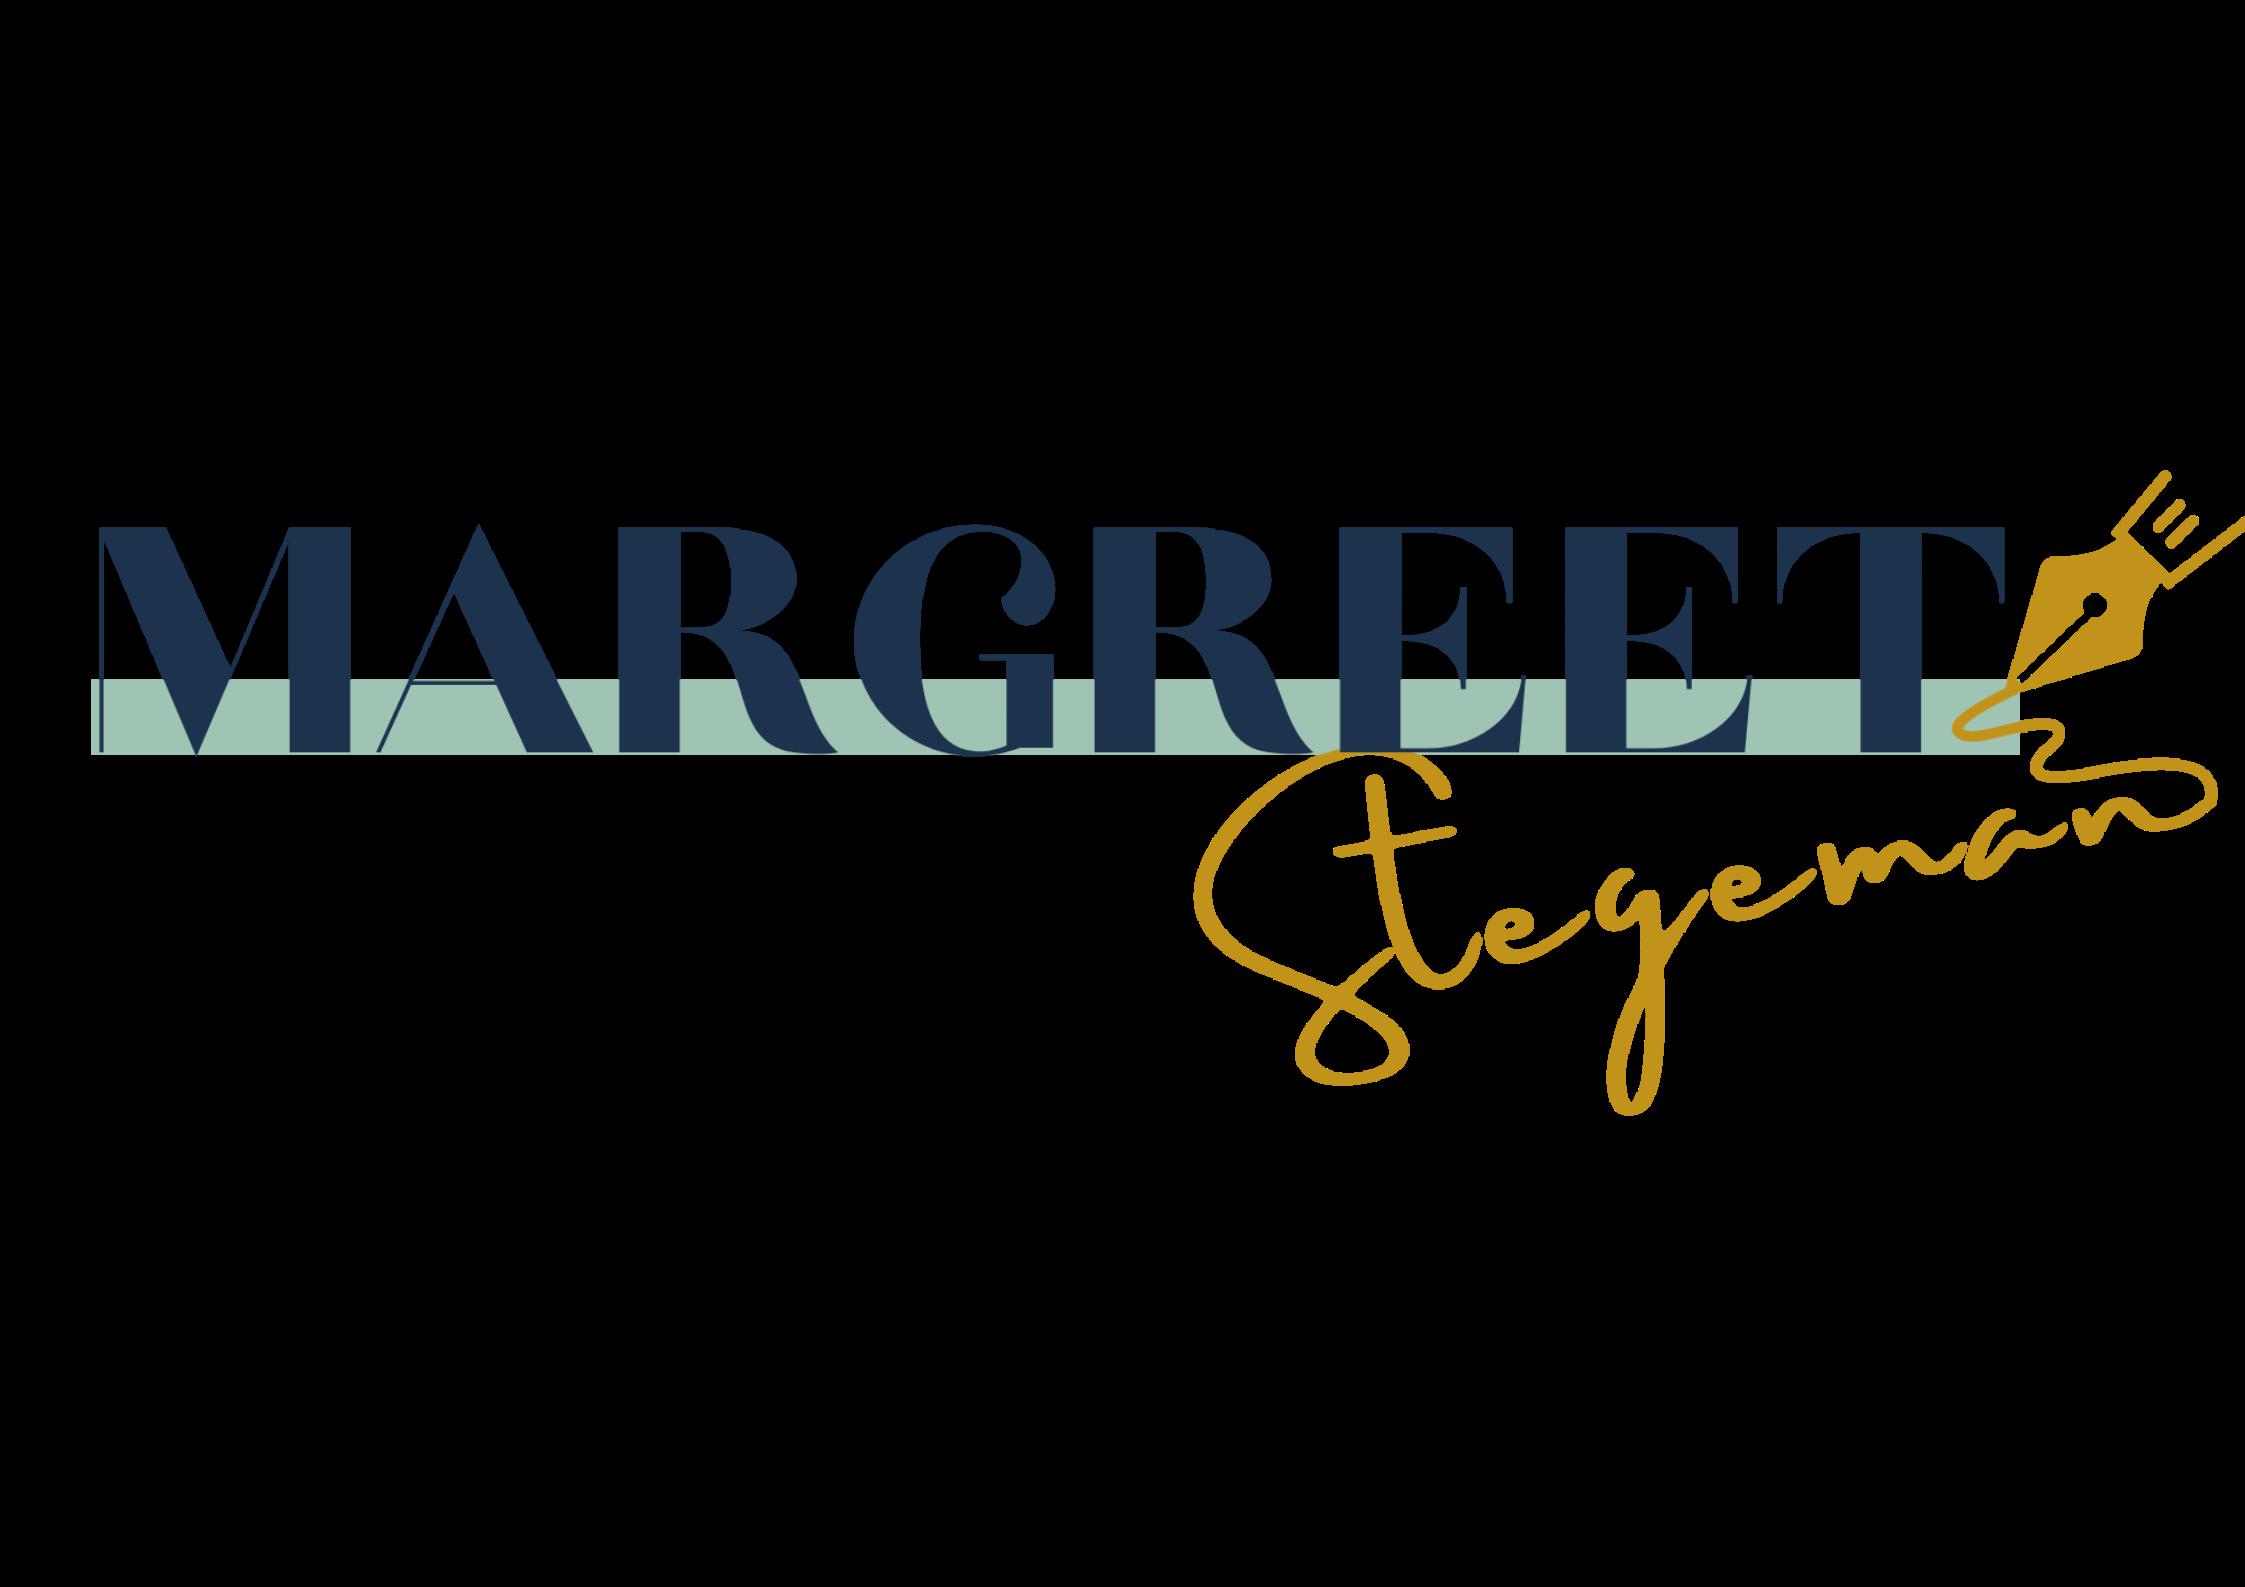 Margreet Stegeman